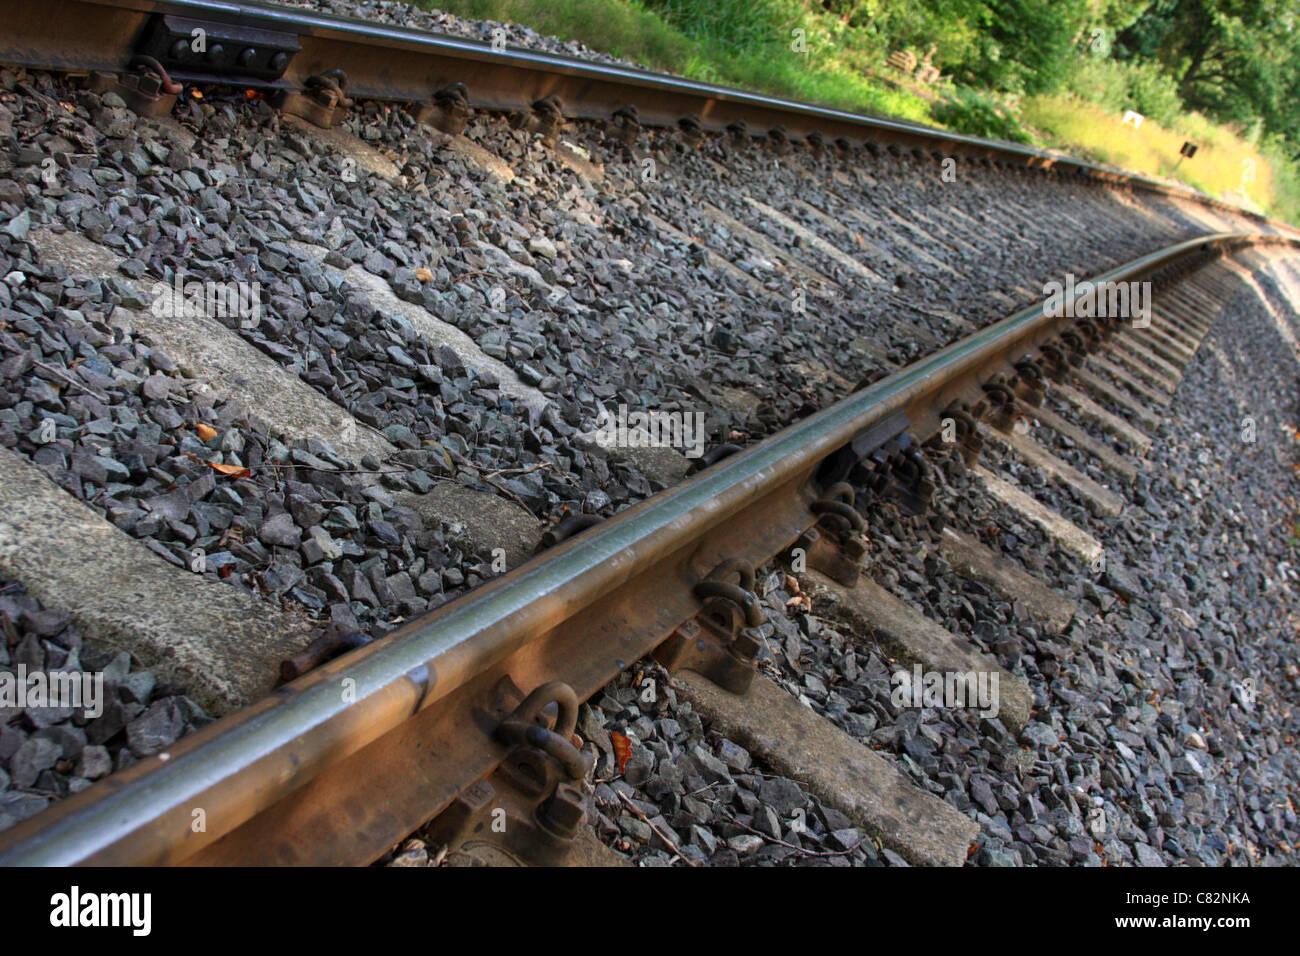 Railway Tracks, England, Europe - Stock Image